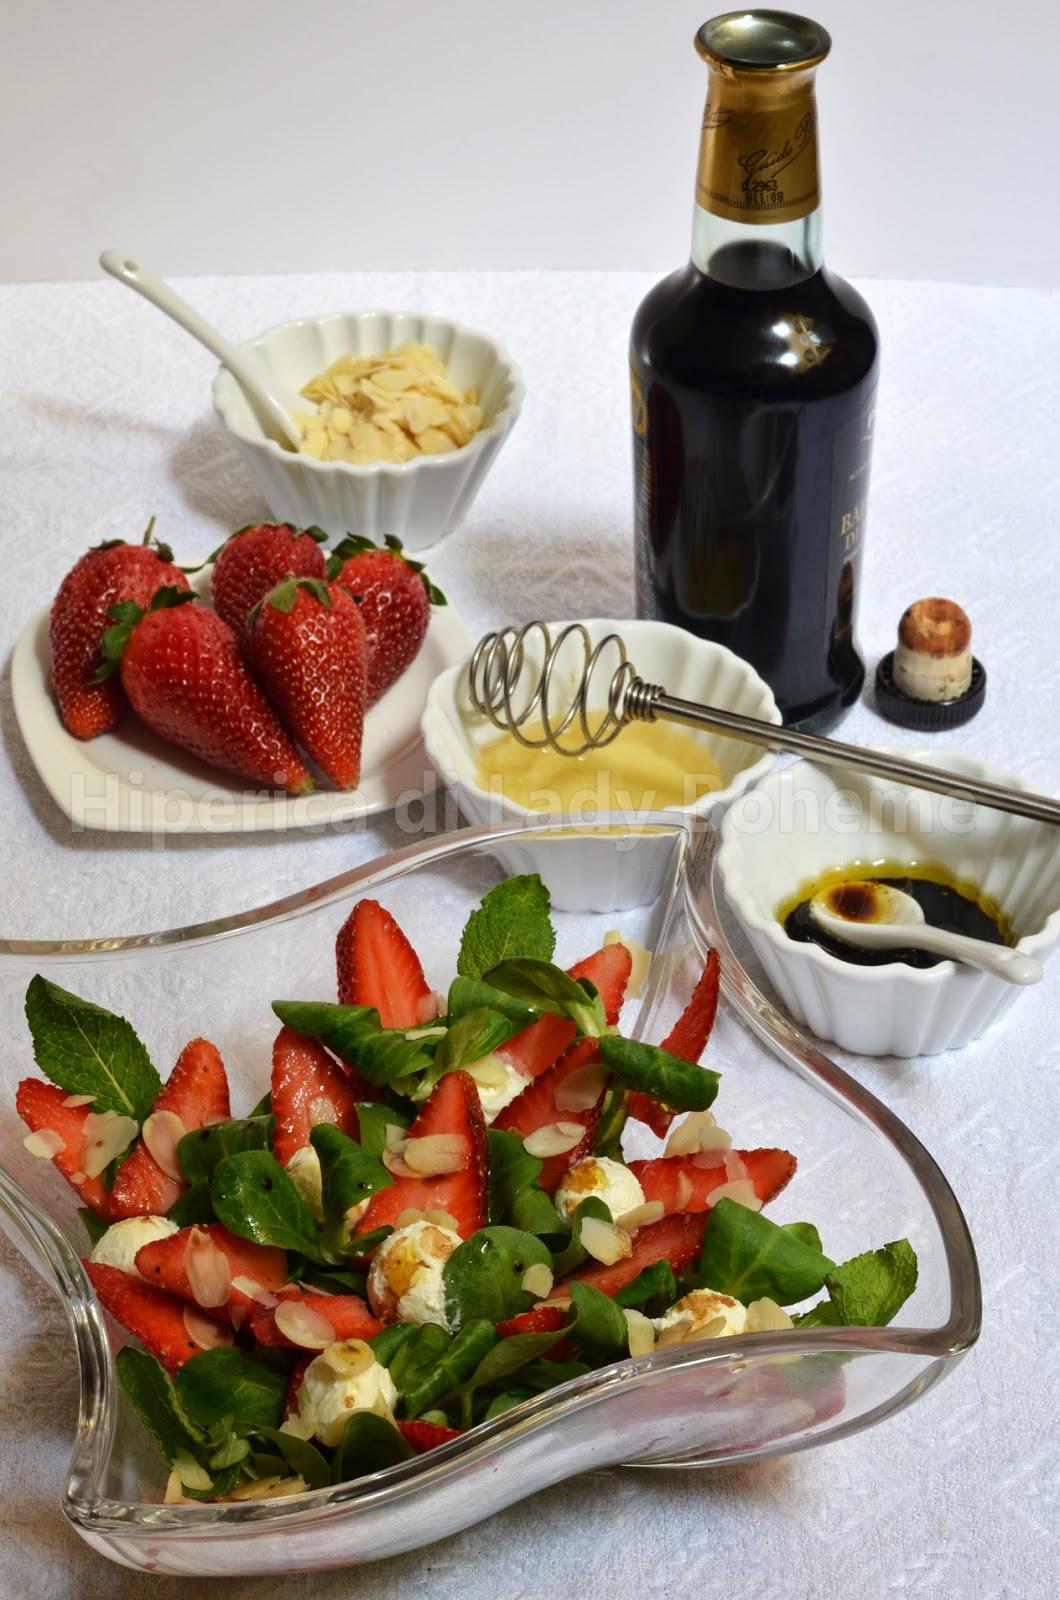 hiperica_lady_boheme_blog_cucina_ricette_gustose_facili_veloci_insalata_di_fragole_soncino_robiola_1